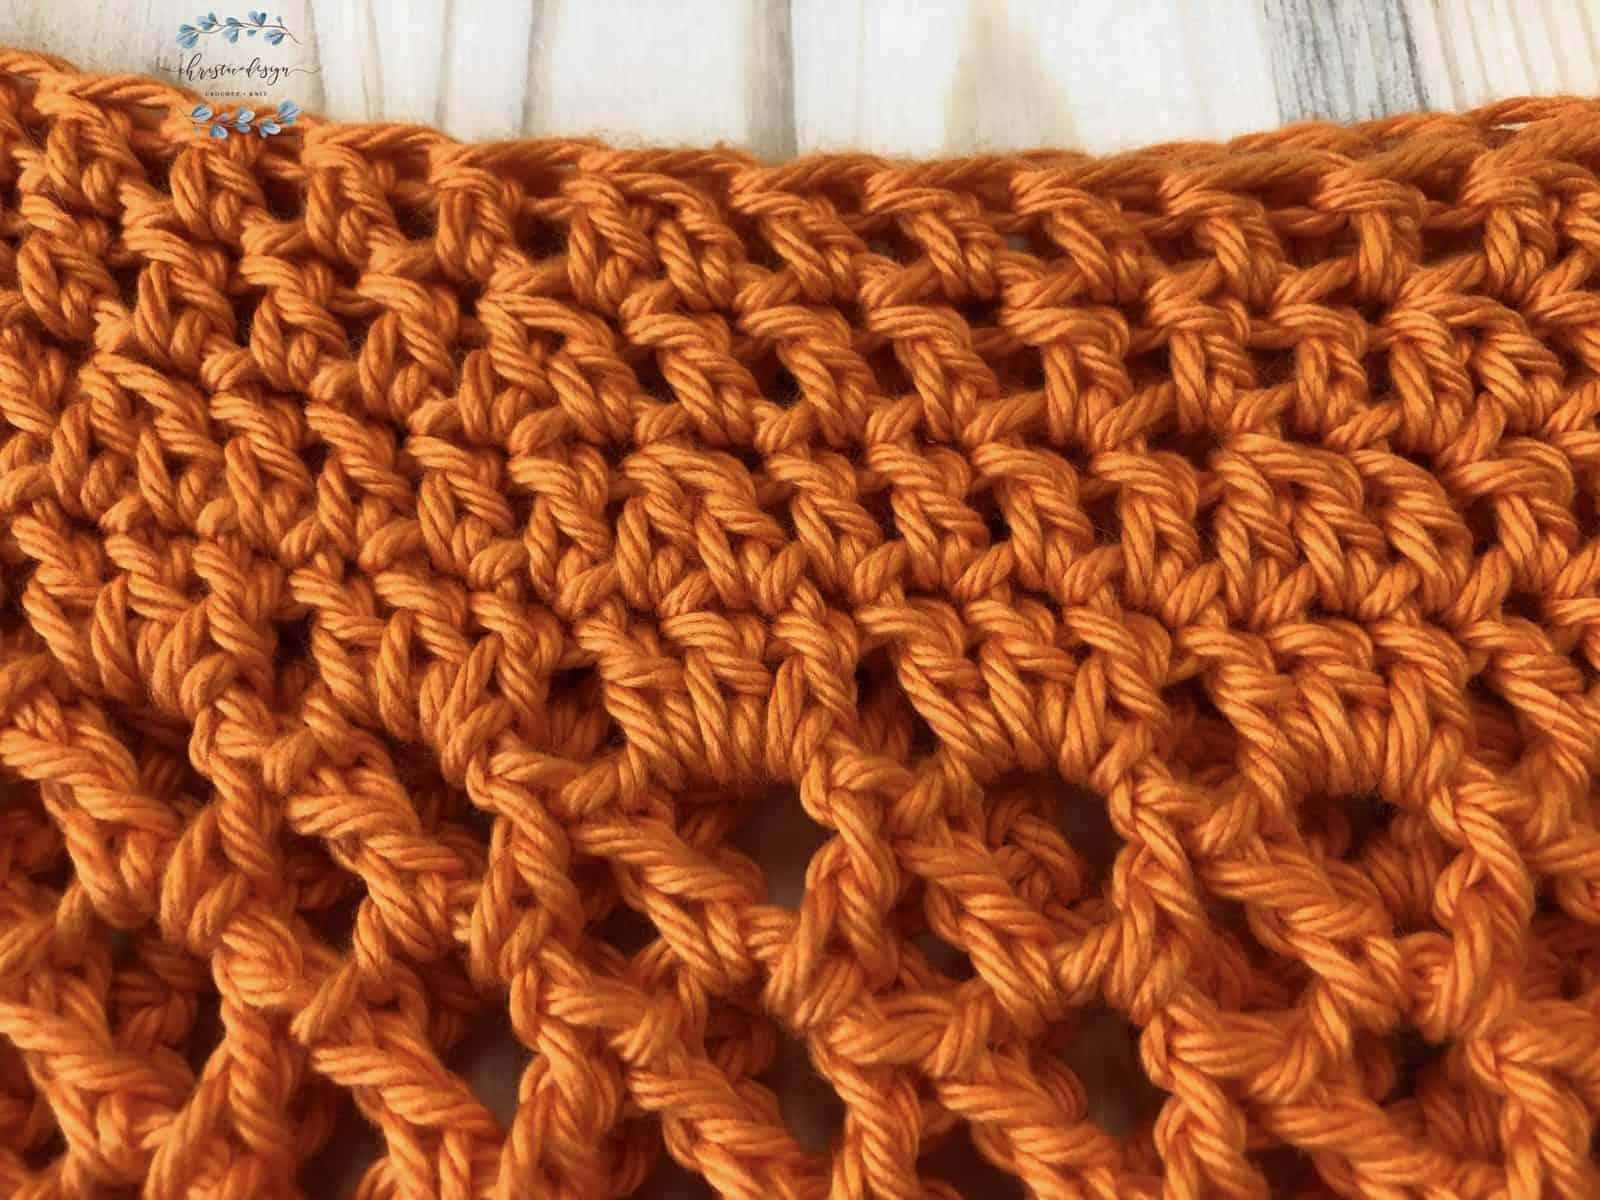 Crochet stitches on orange free crochet tote bag pattern.